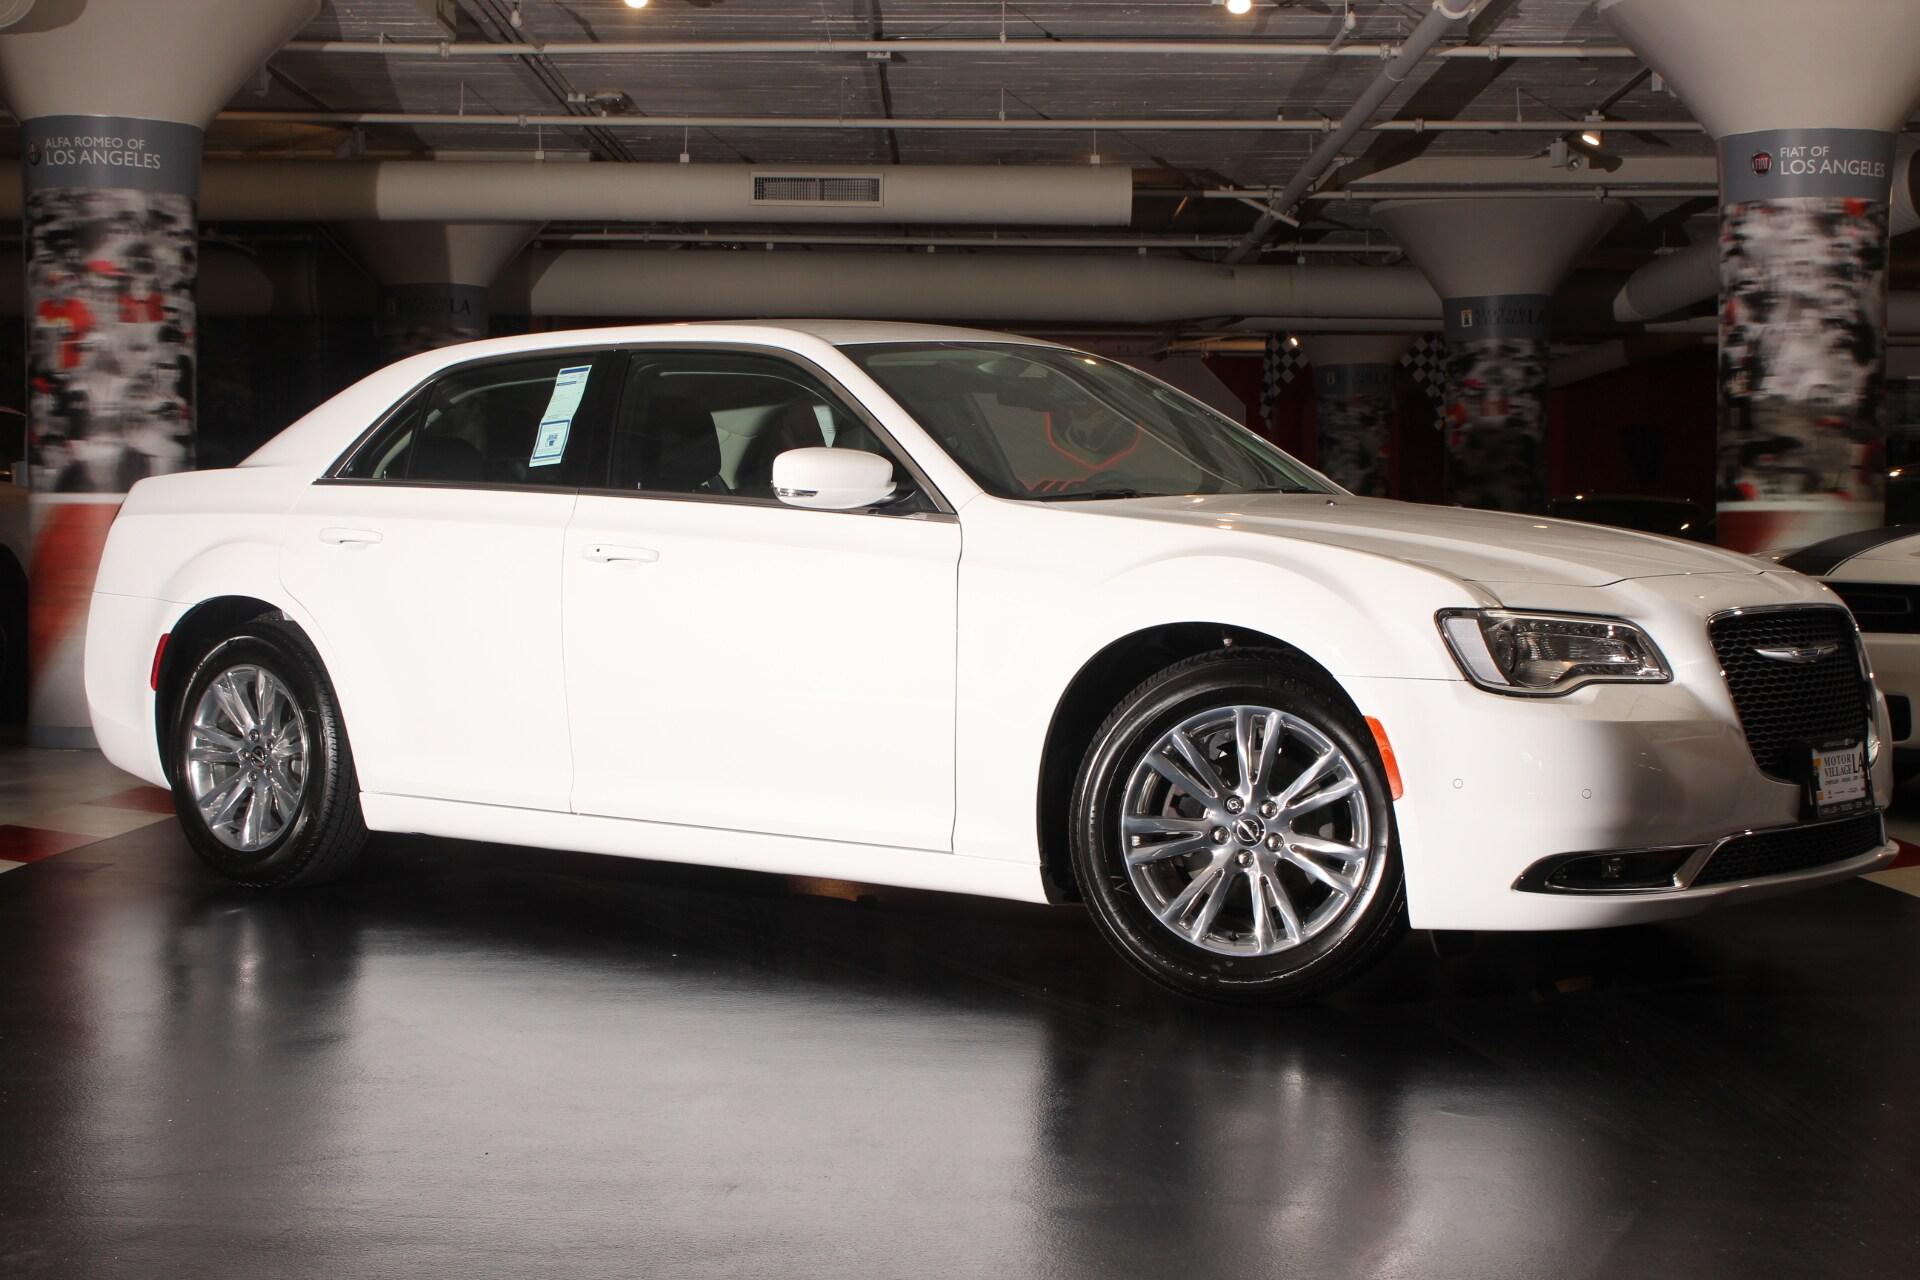 2017 Chrysler 300 Limited  10 Beats Premium Speakers wSubwoofer 300 Premium Group 5-Year Siriu